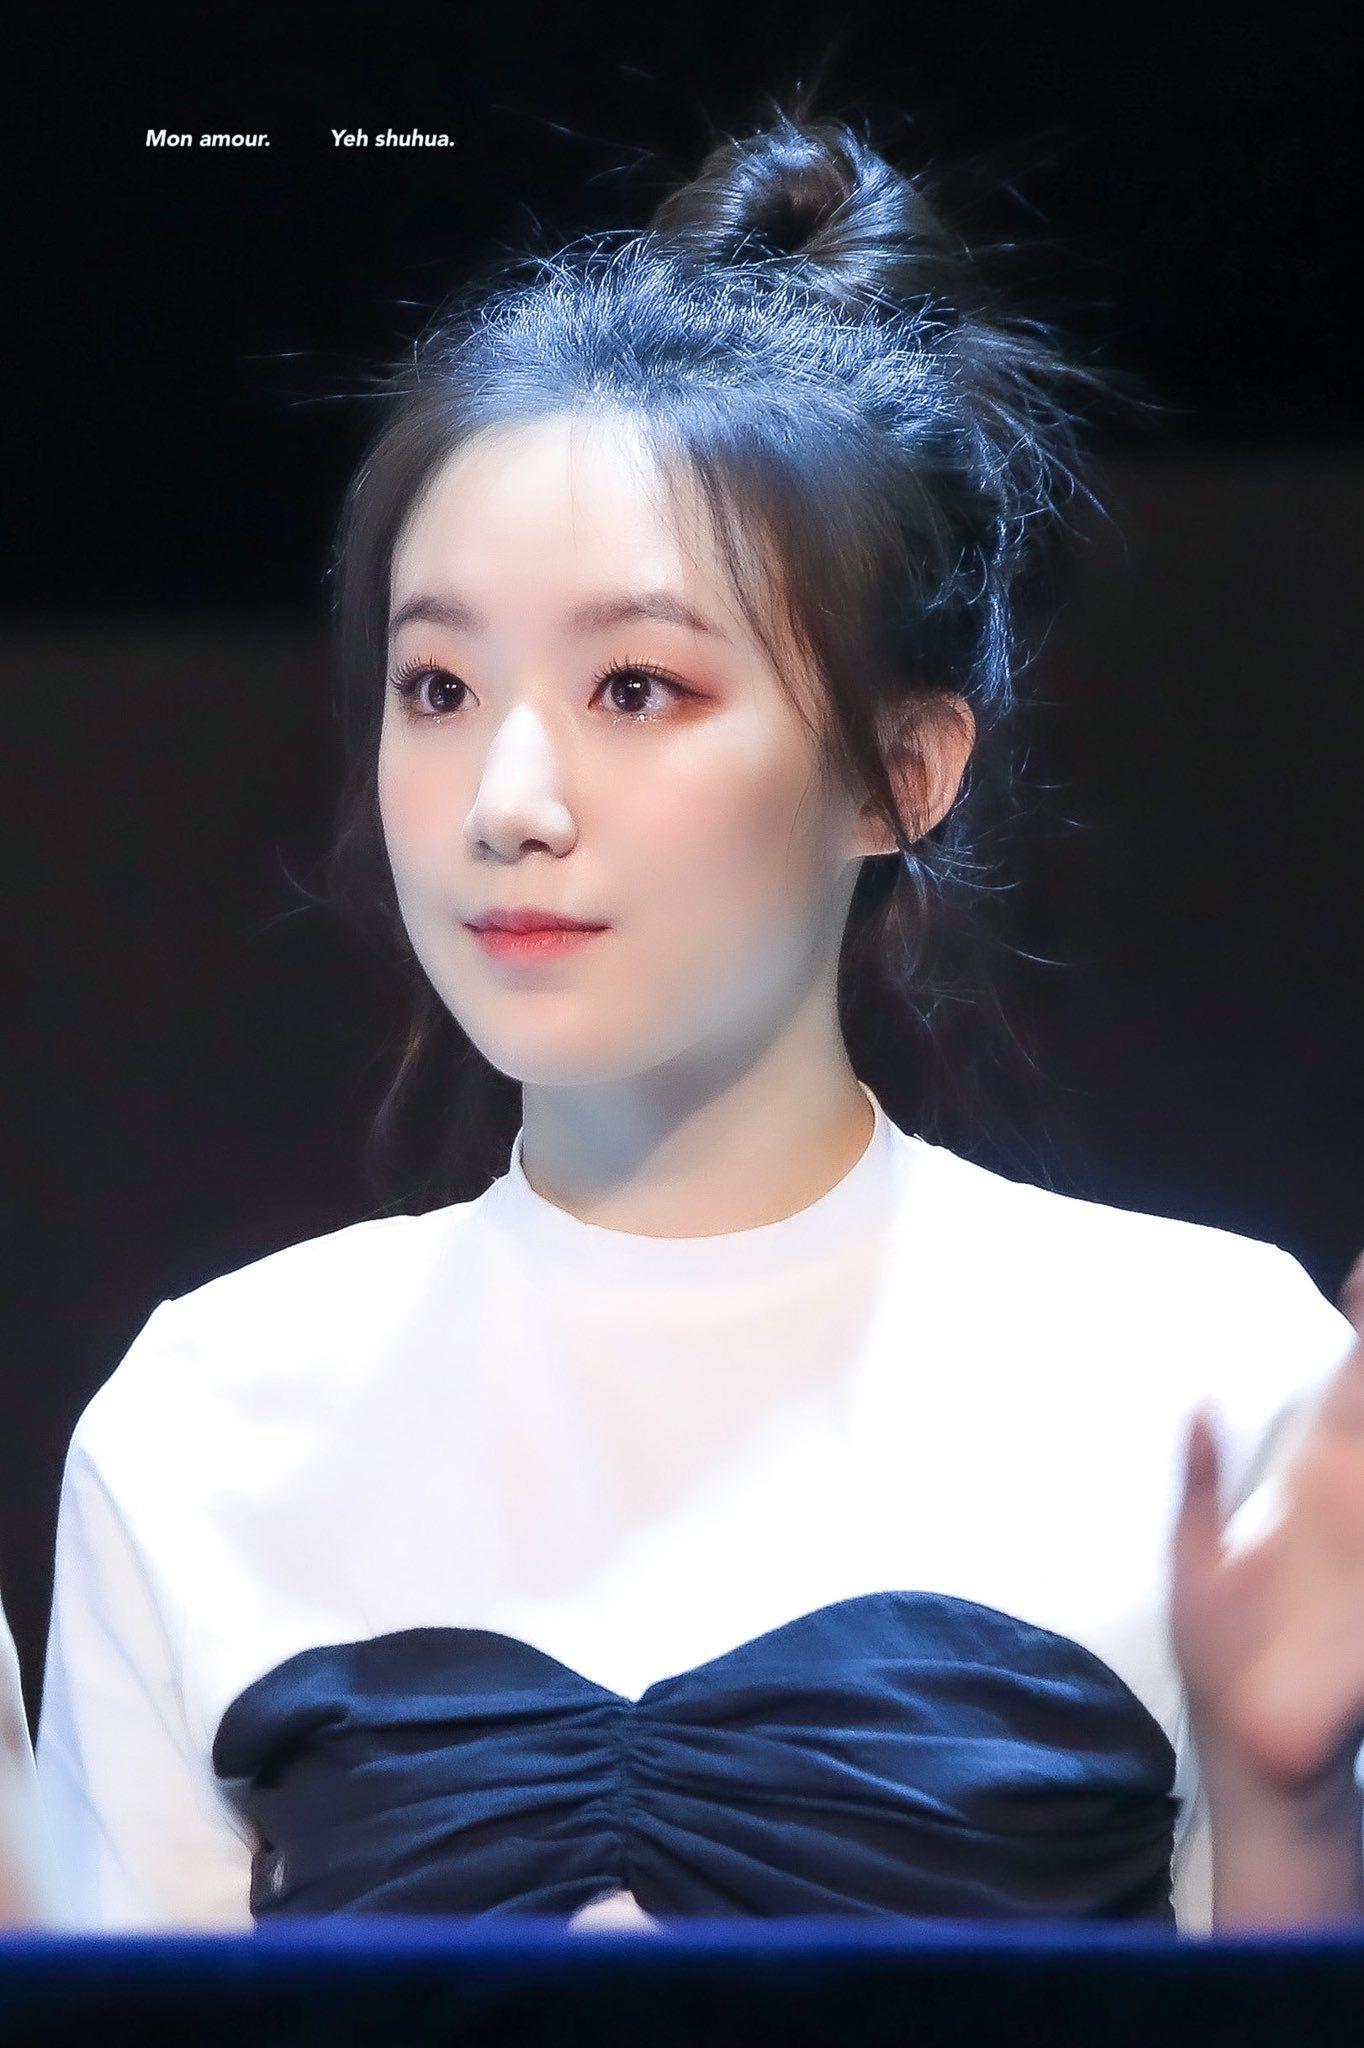 Shuhua Pics On Twitter Asian Beauty Kpop Girls Pics